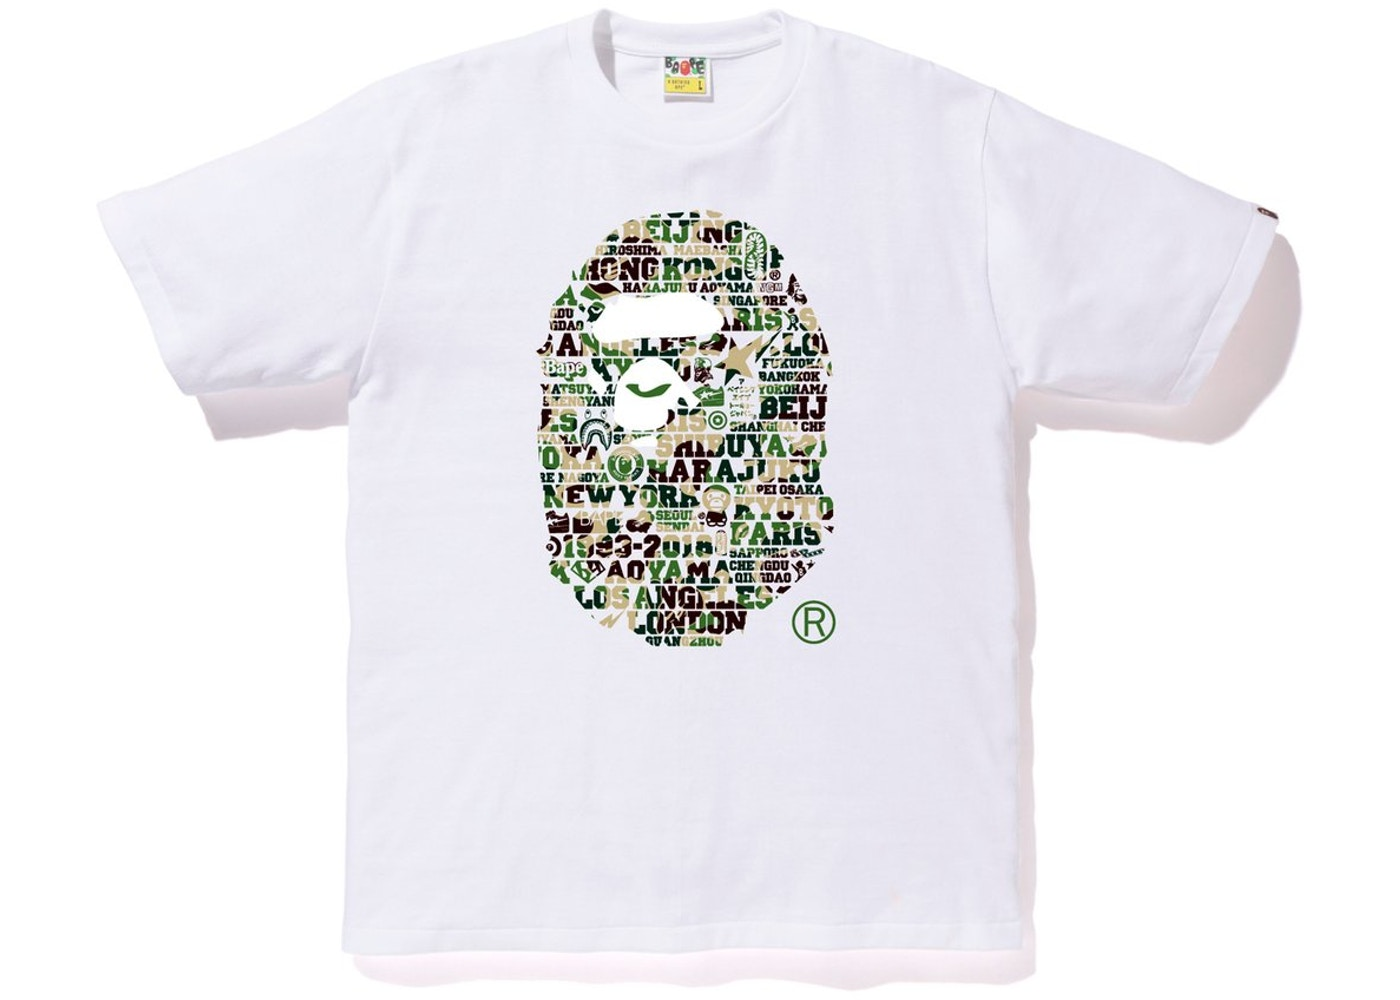 c47a3a63651d Streetwear - Bape T-Shirts - New Lowest Asks